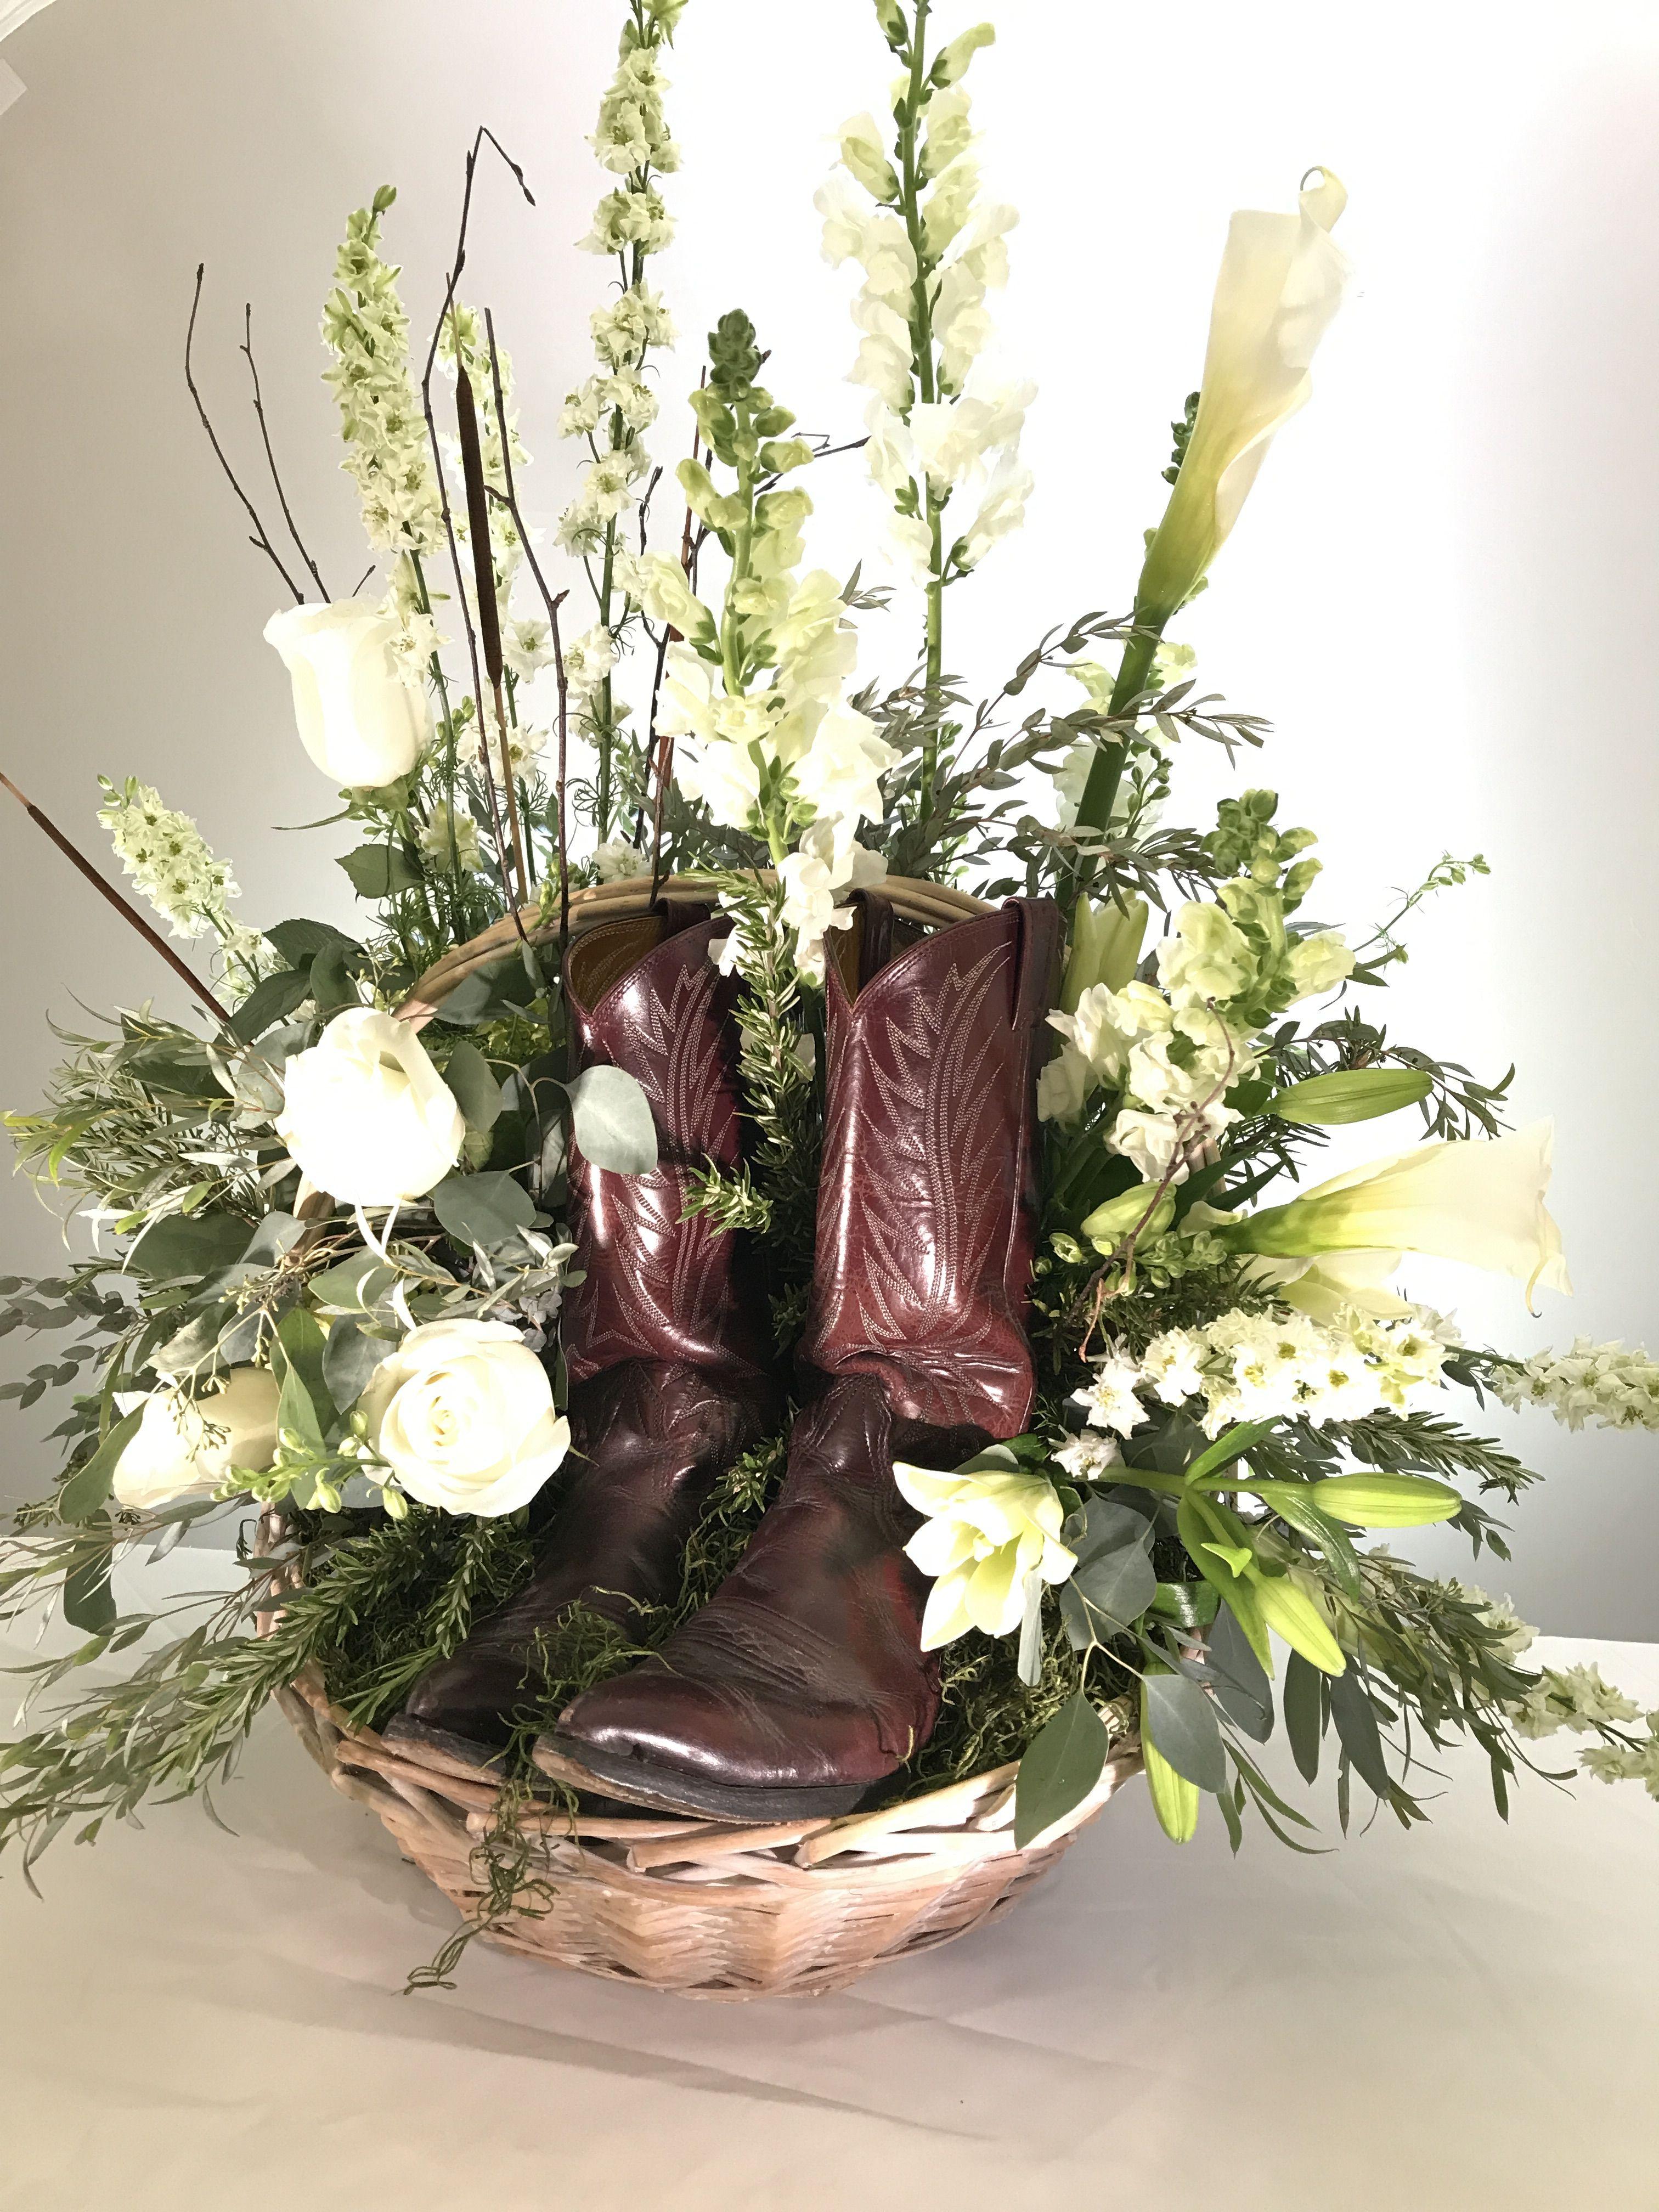 Personalized tribute flowers cowboy boots funeral flowers white personalized tribute flowers cowboy boots funeral flowers white funeral flower arrangement izmirmasajfo